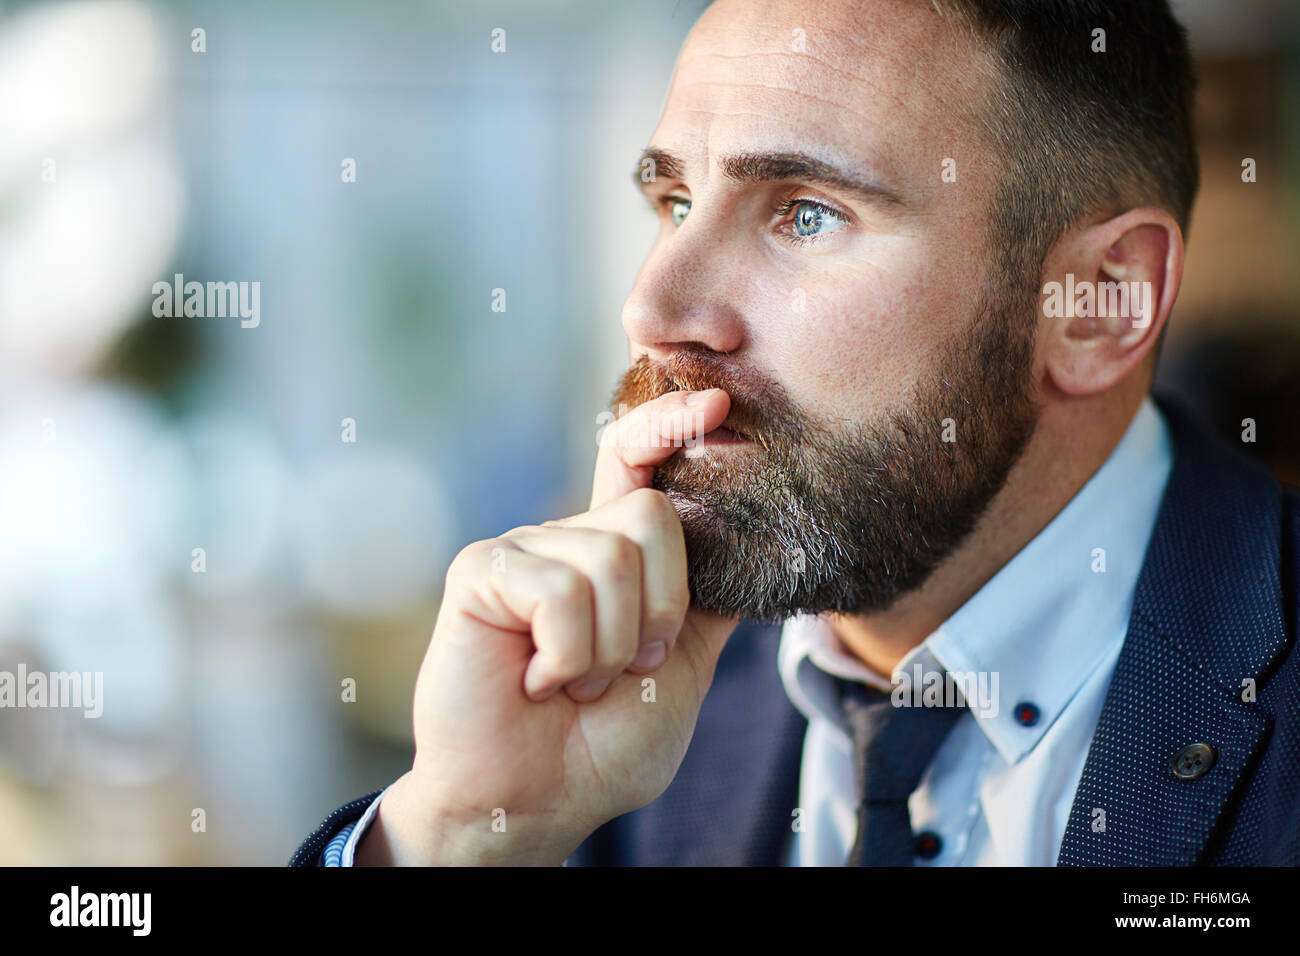 Pensive man touching his chin - Stock Image